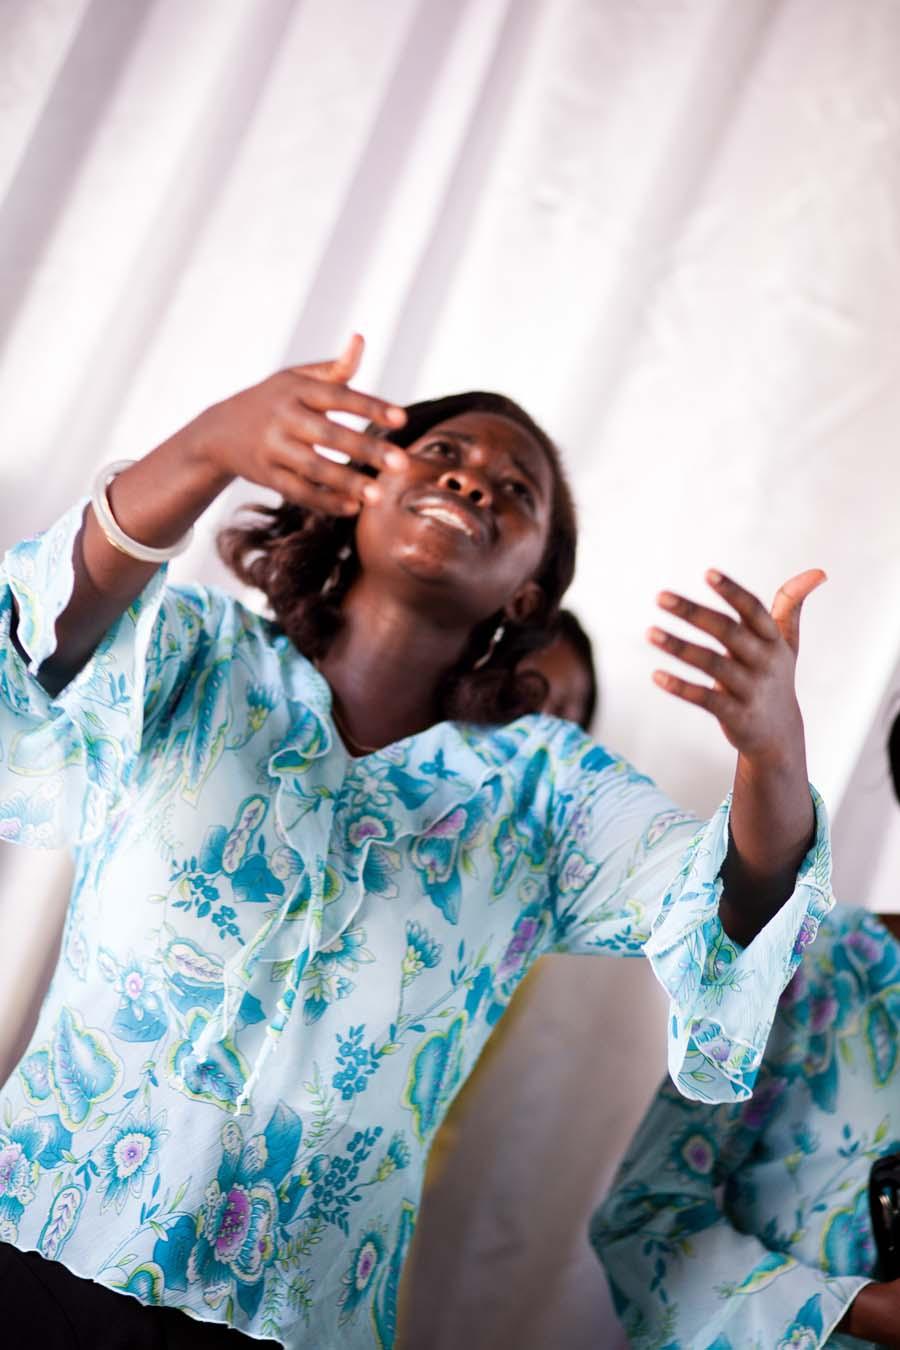 jessicadavisphotography.com | Jessica Davis Photography | Portrait Work in Uganda| Travel Photographer | World Event Photographs 5 (11).jpg